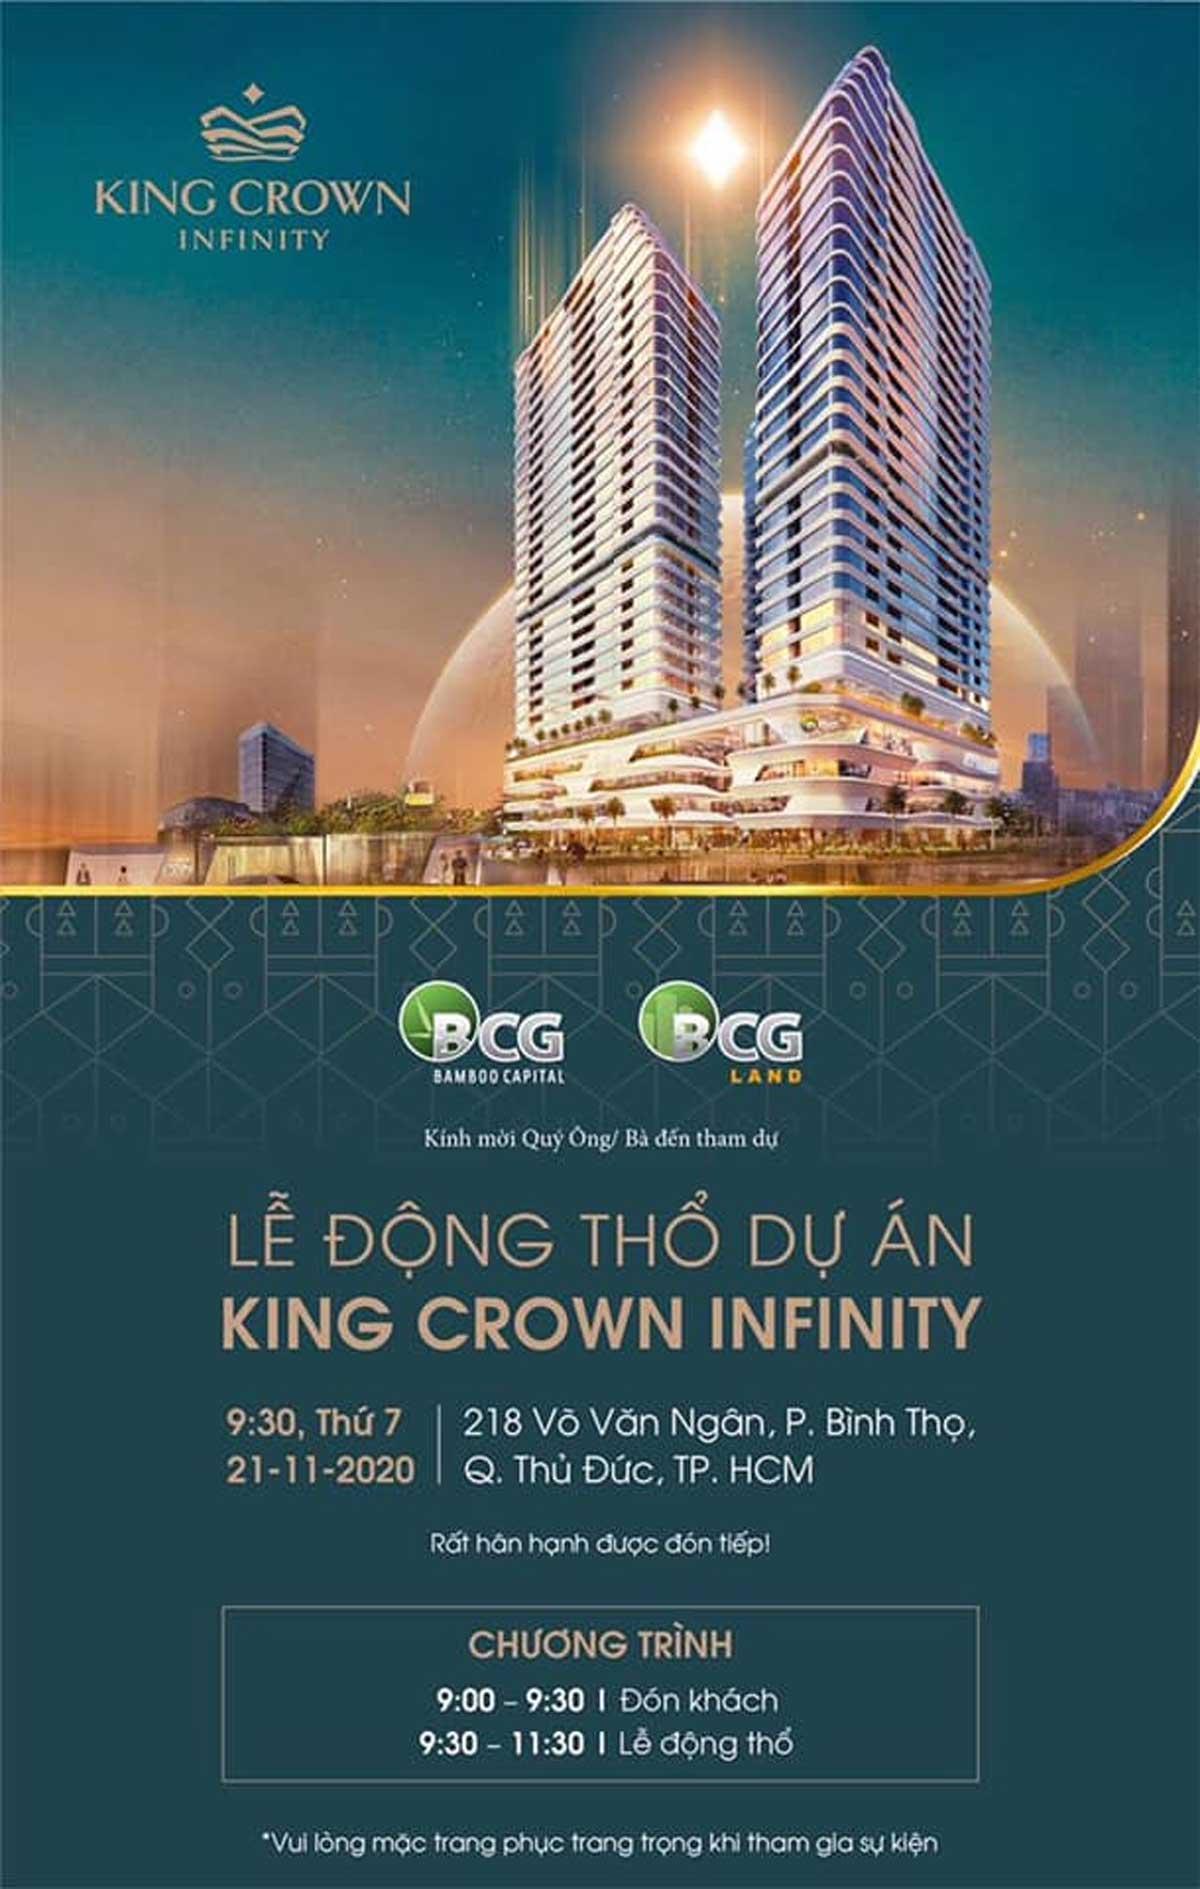 le dong tho du an king crown infinity thu duc - KING CROWN INFINITY THỦ ĐỨC